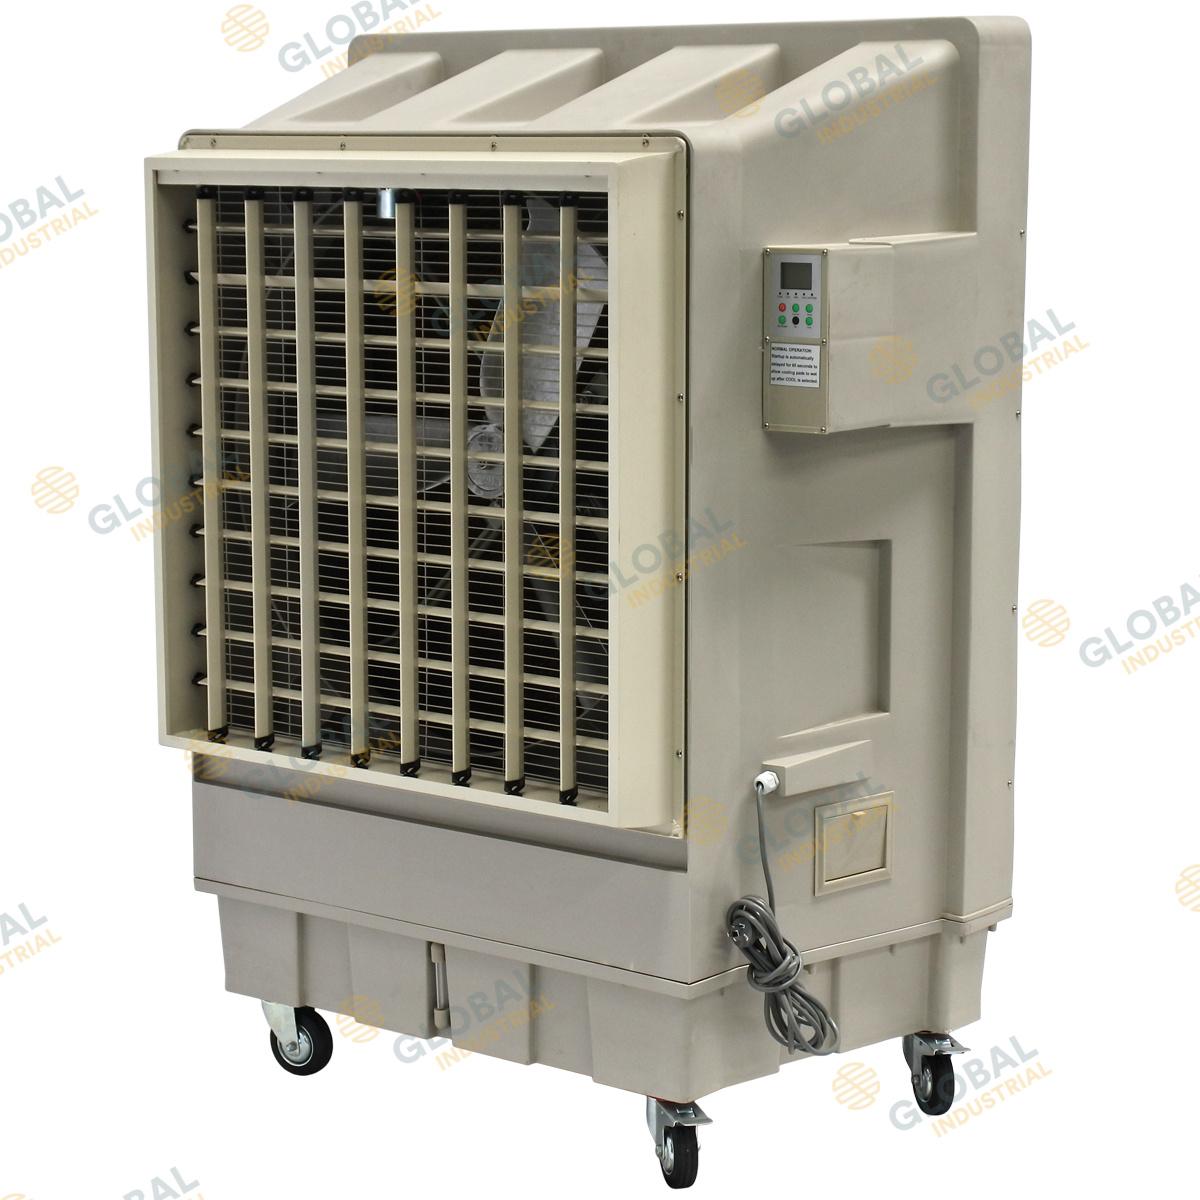 Evaporative Condensing Unit : Evaporative air conditioner portable